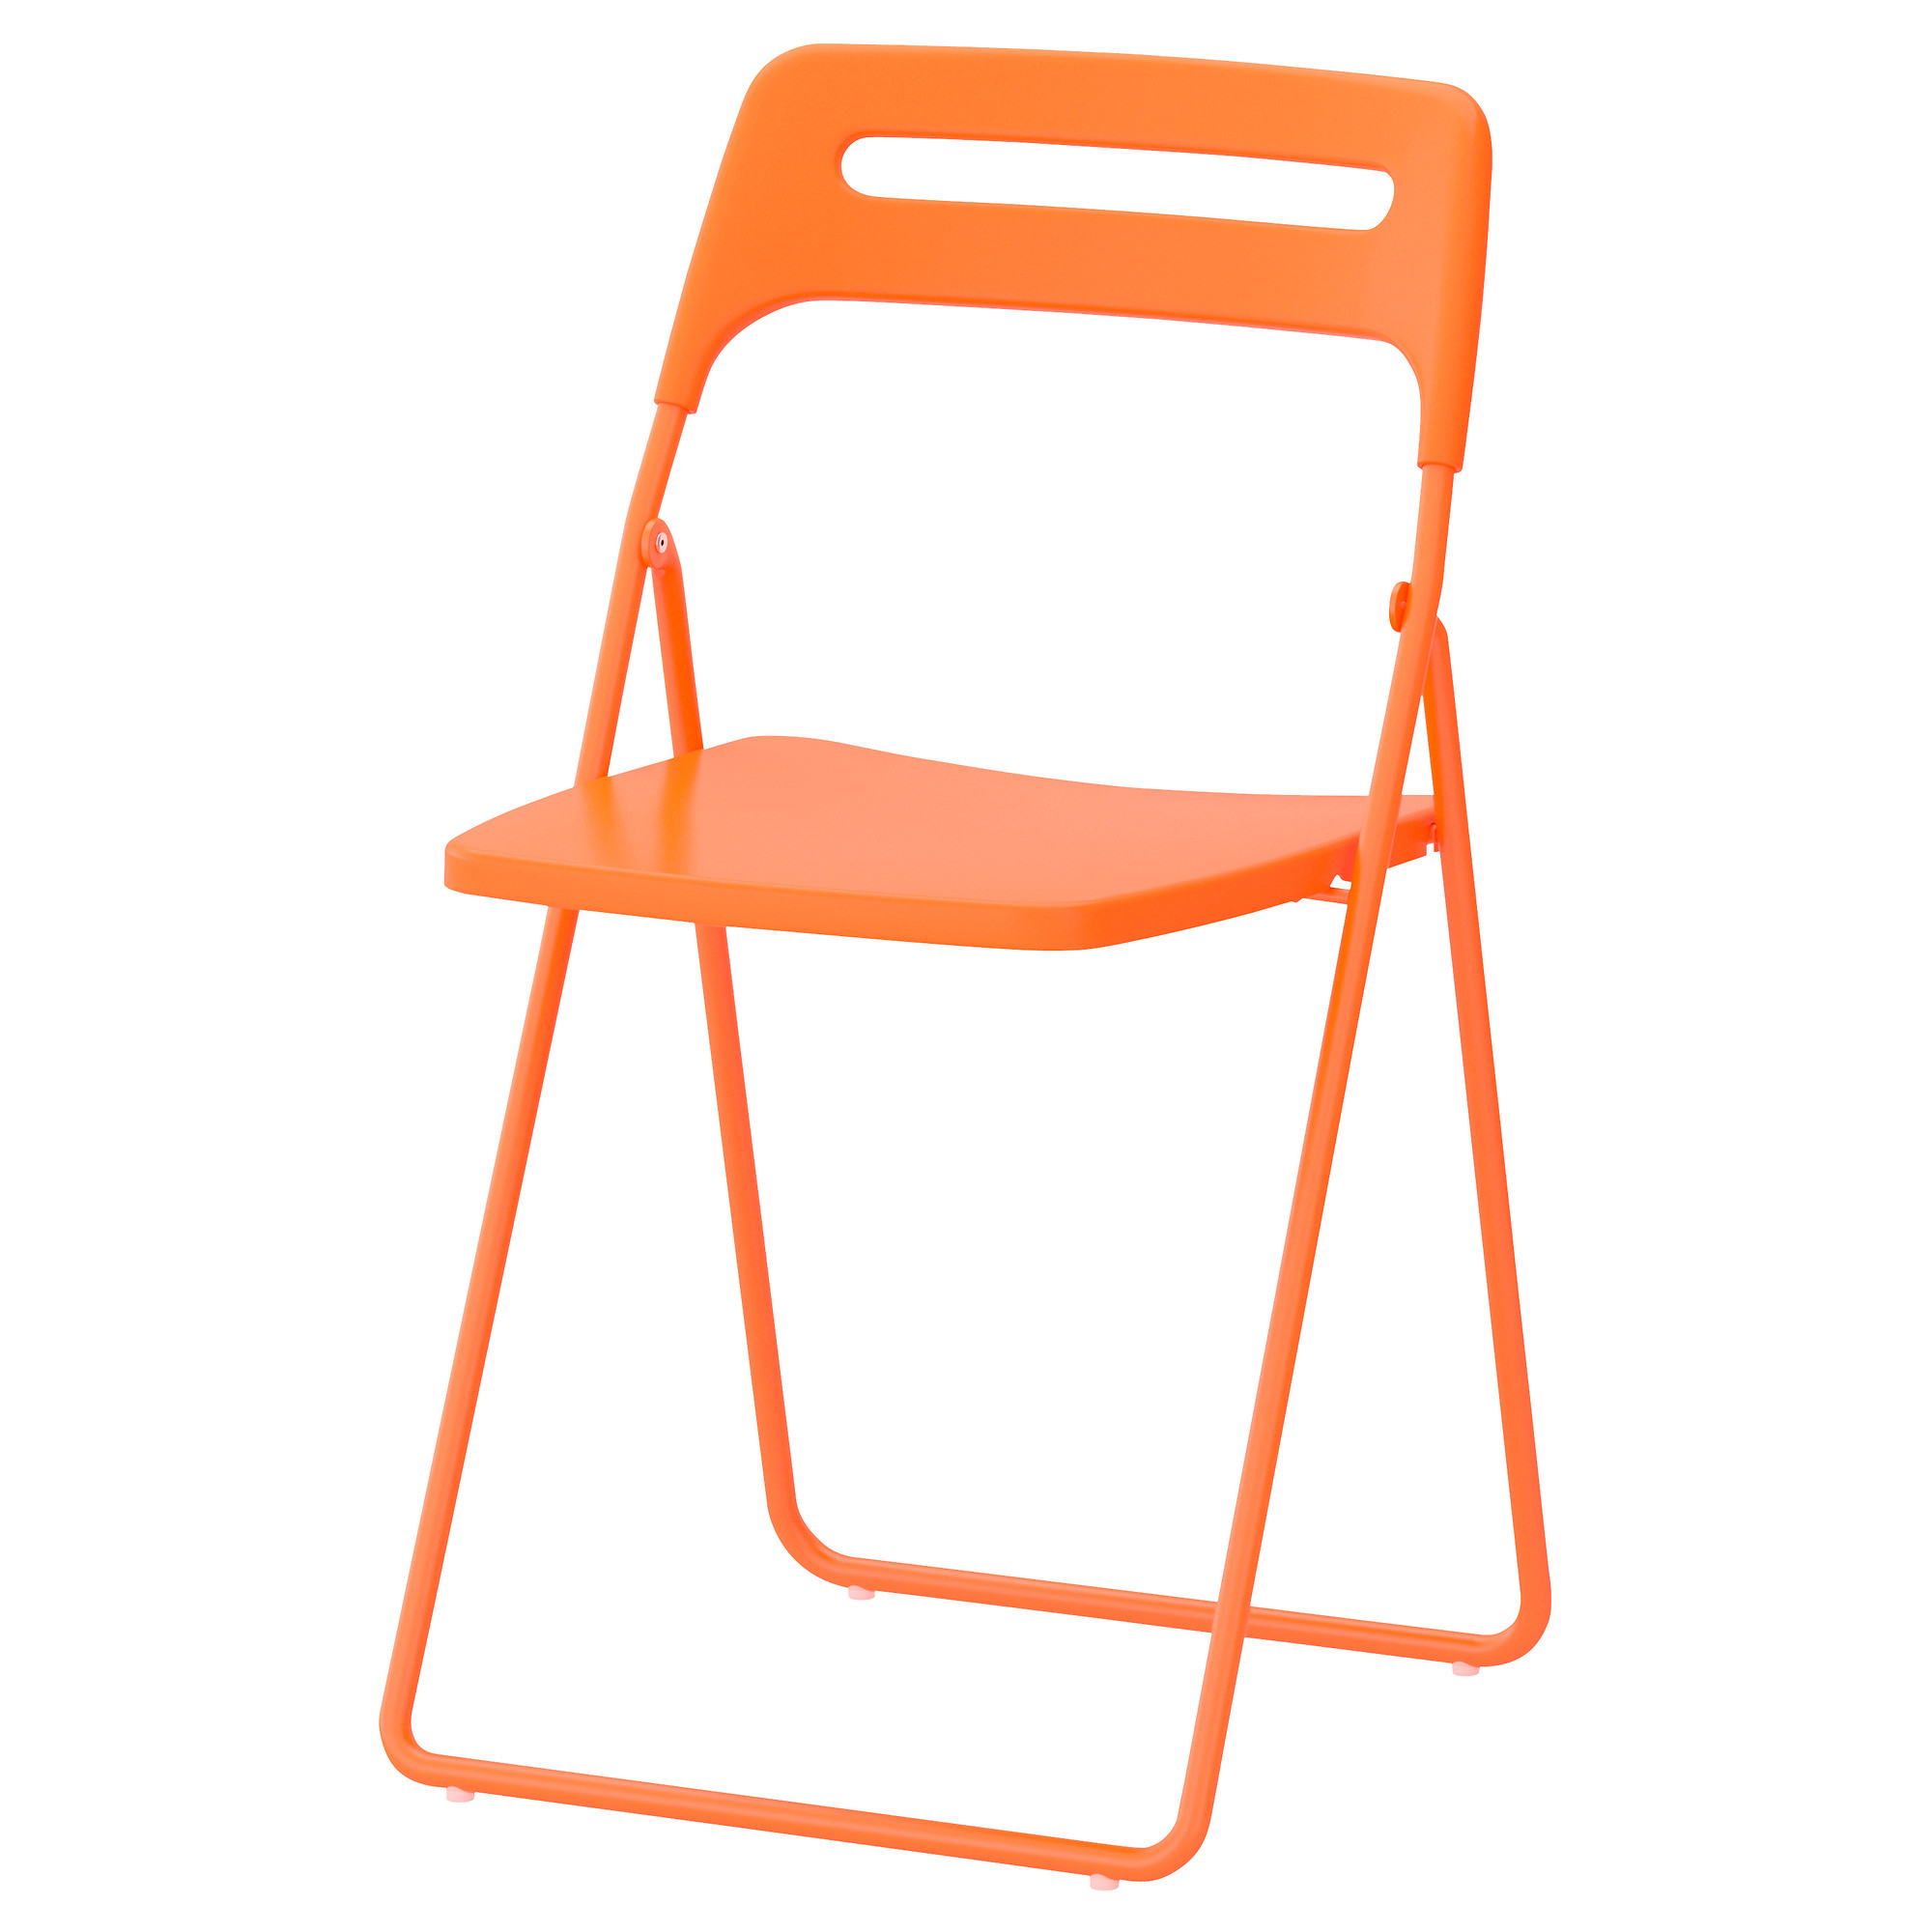 Чертеж стула для секса 20 фотография